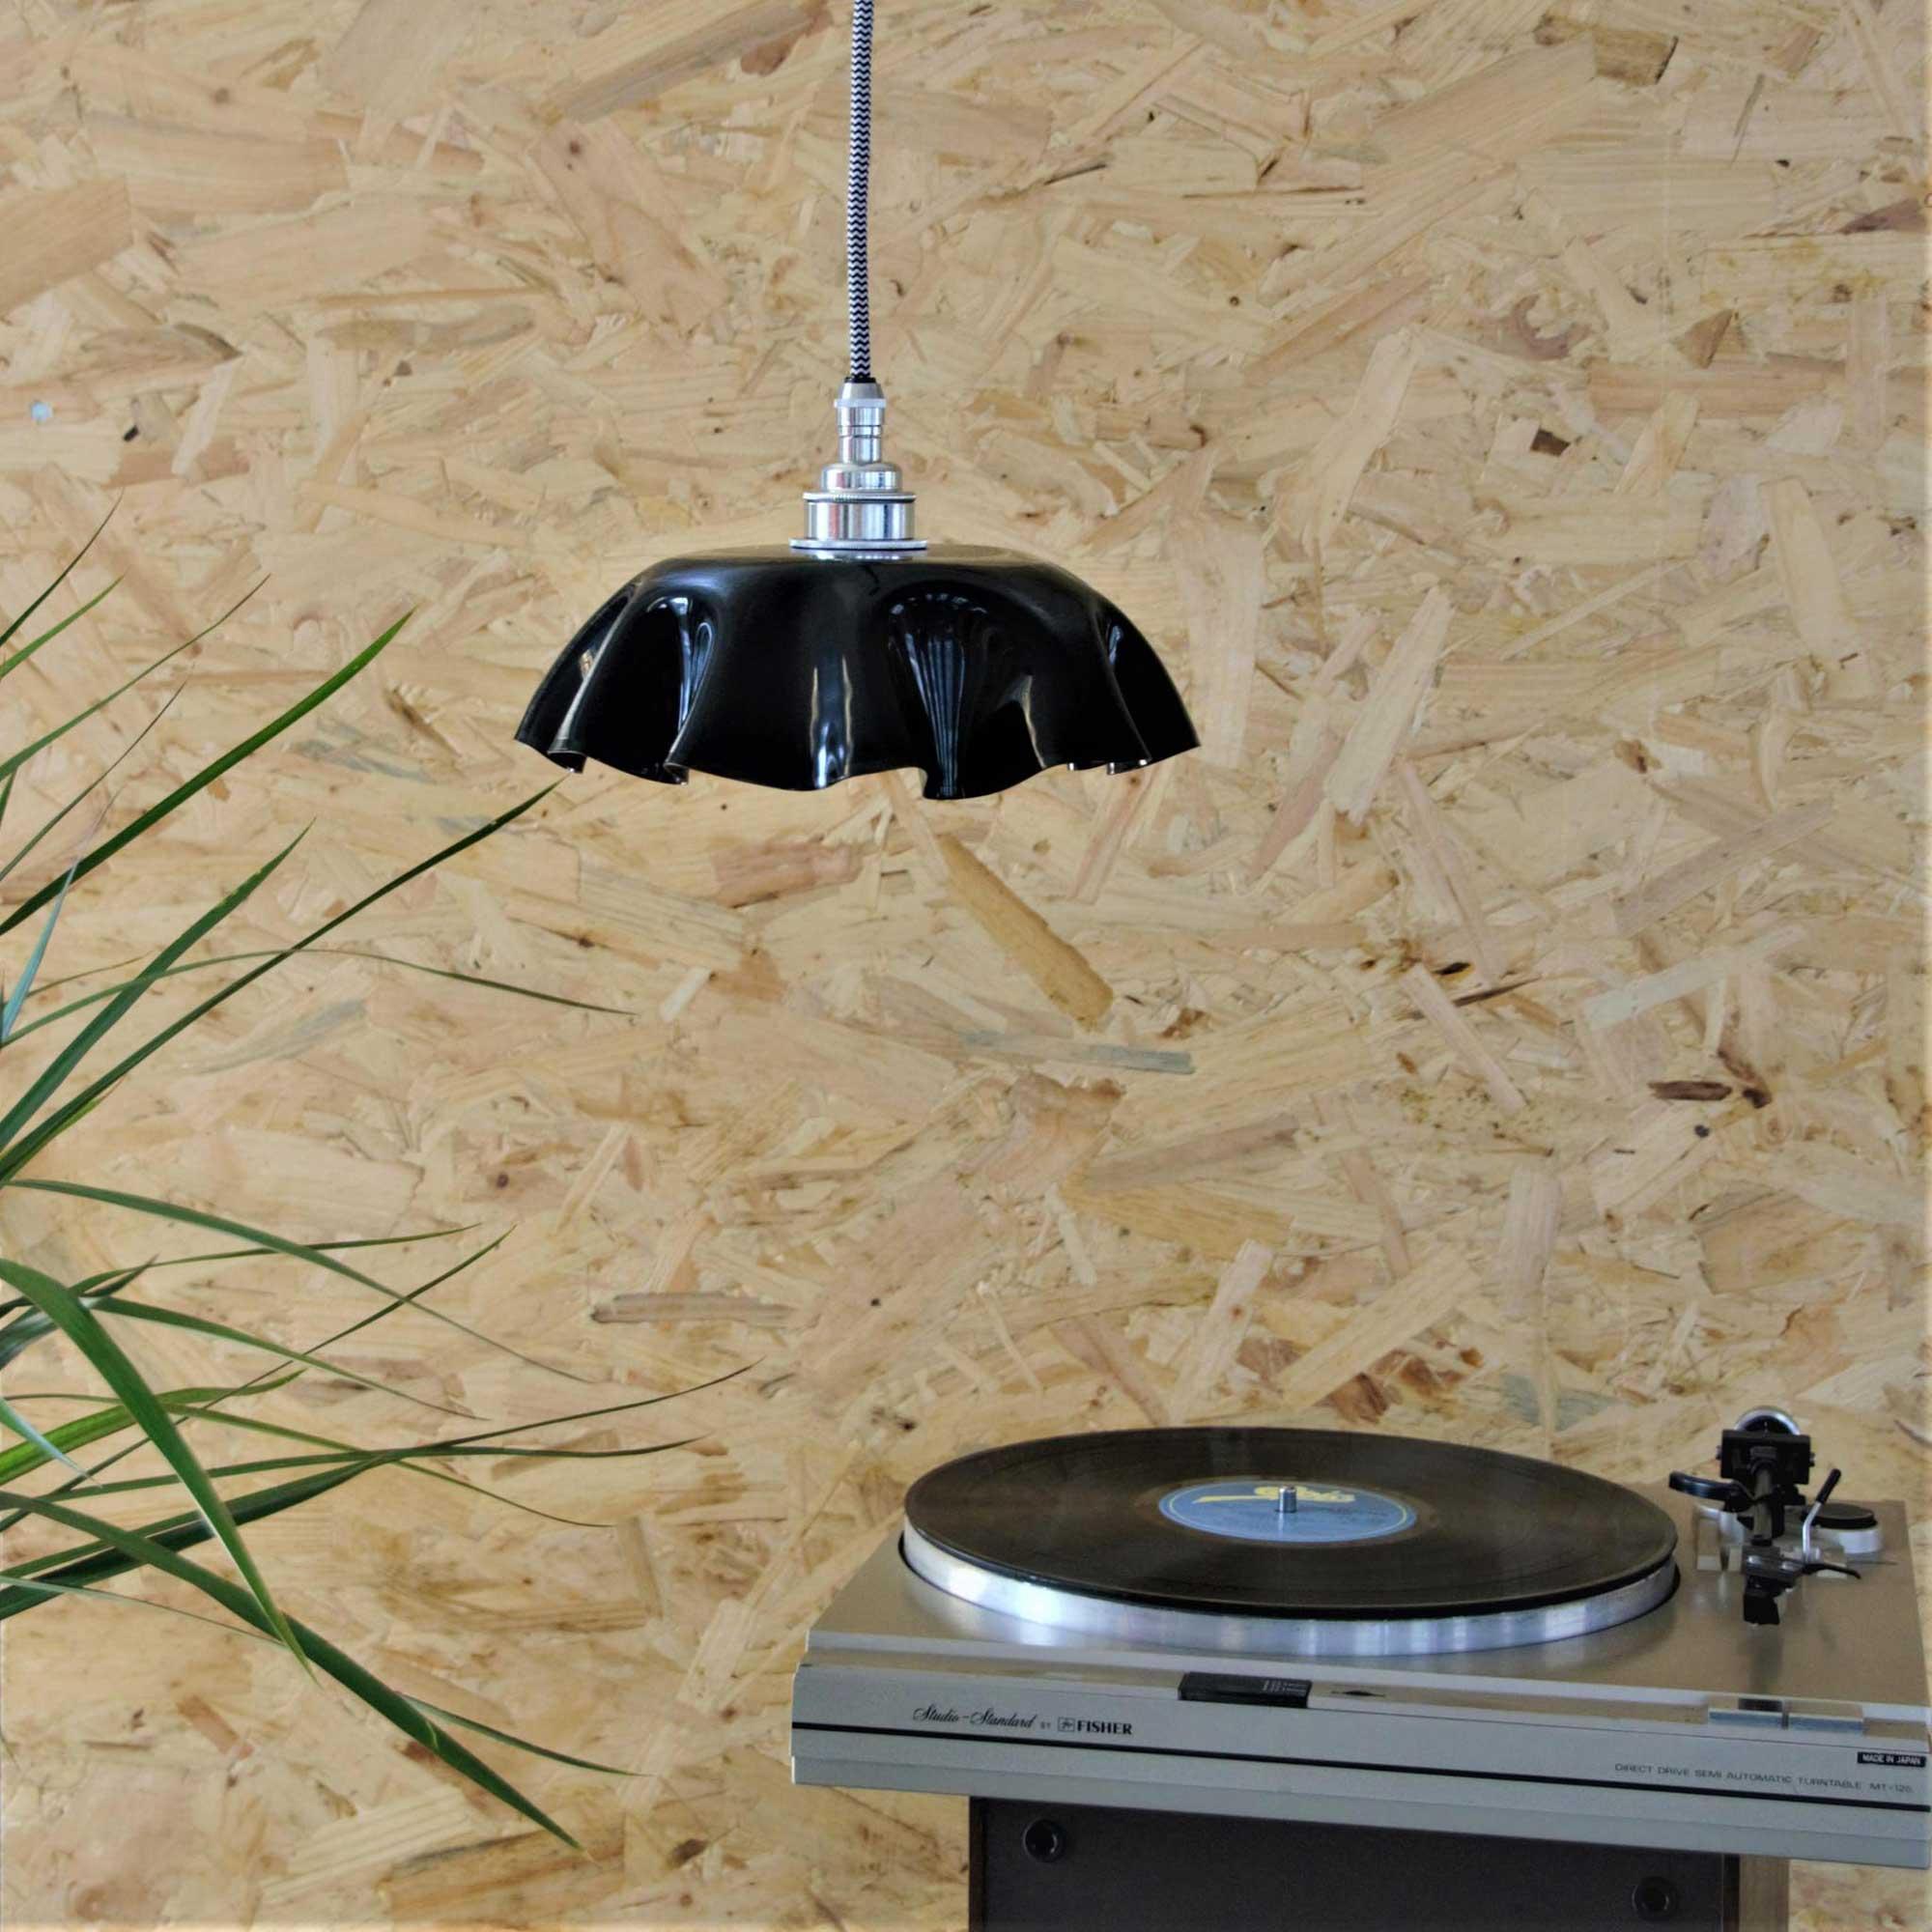 Izrada sjenila za lampu od gramofonske ploče